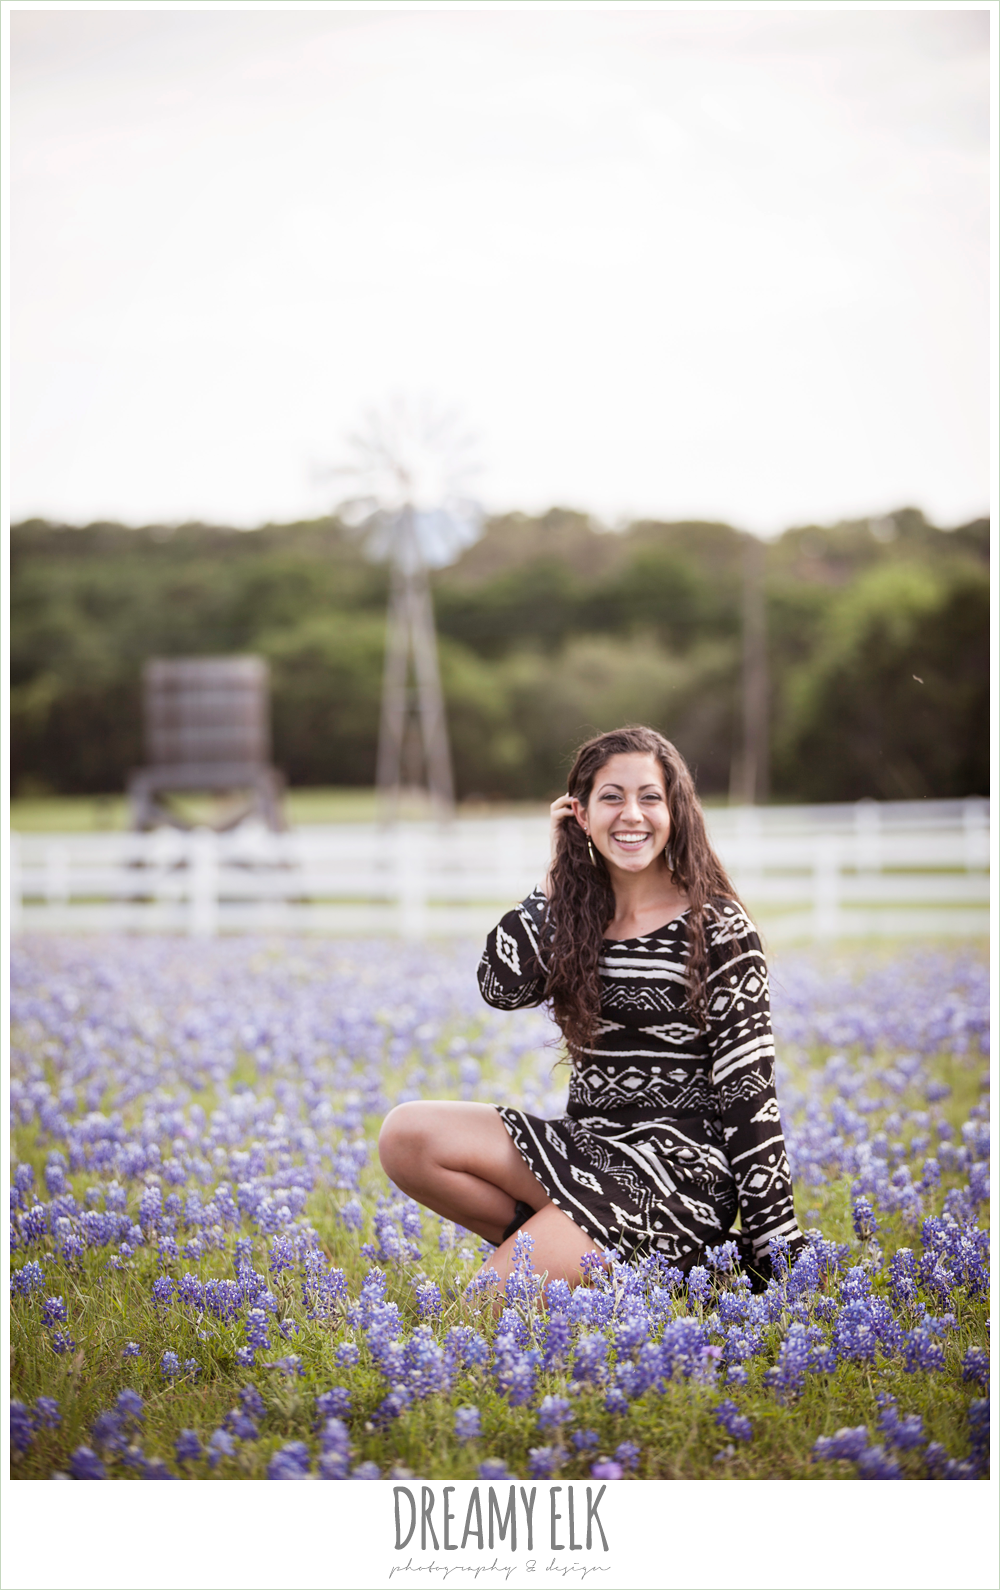 outdoor high school senior photo, texas bluebonnets, austin, texas {dreamy elk photography and design}